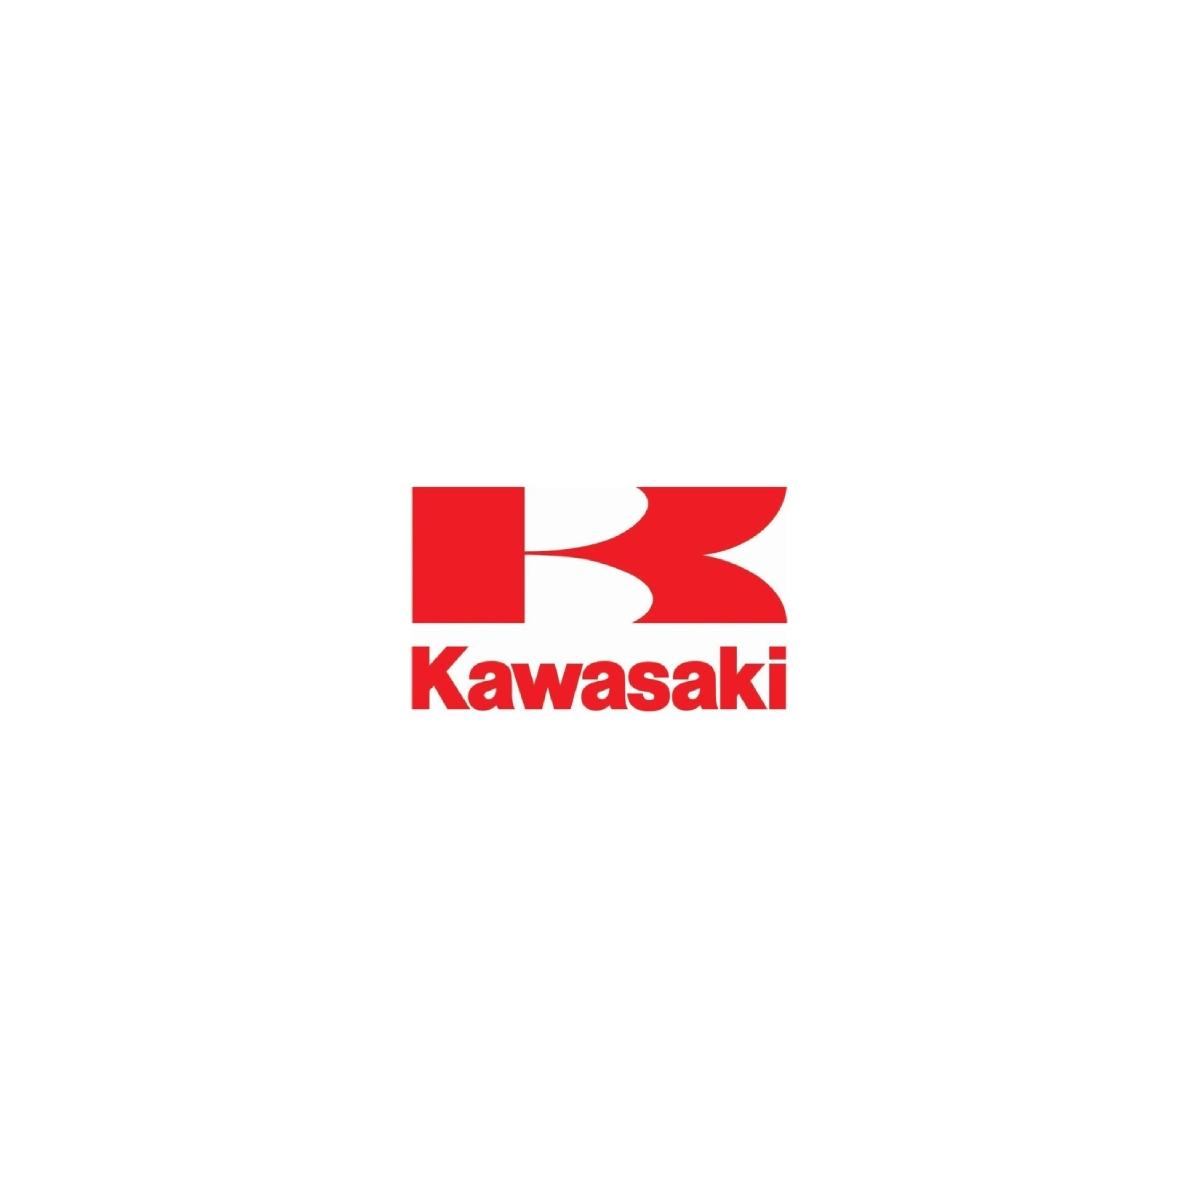 Hélice Solas para Jet Ski Kawasaki SXI Pro 750 95/02 09/15  - Radical Peças - Peças para Jet Ski